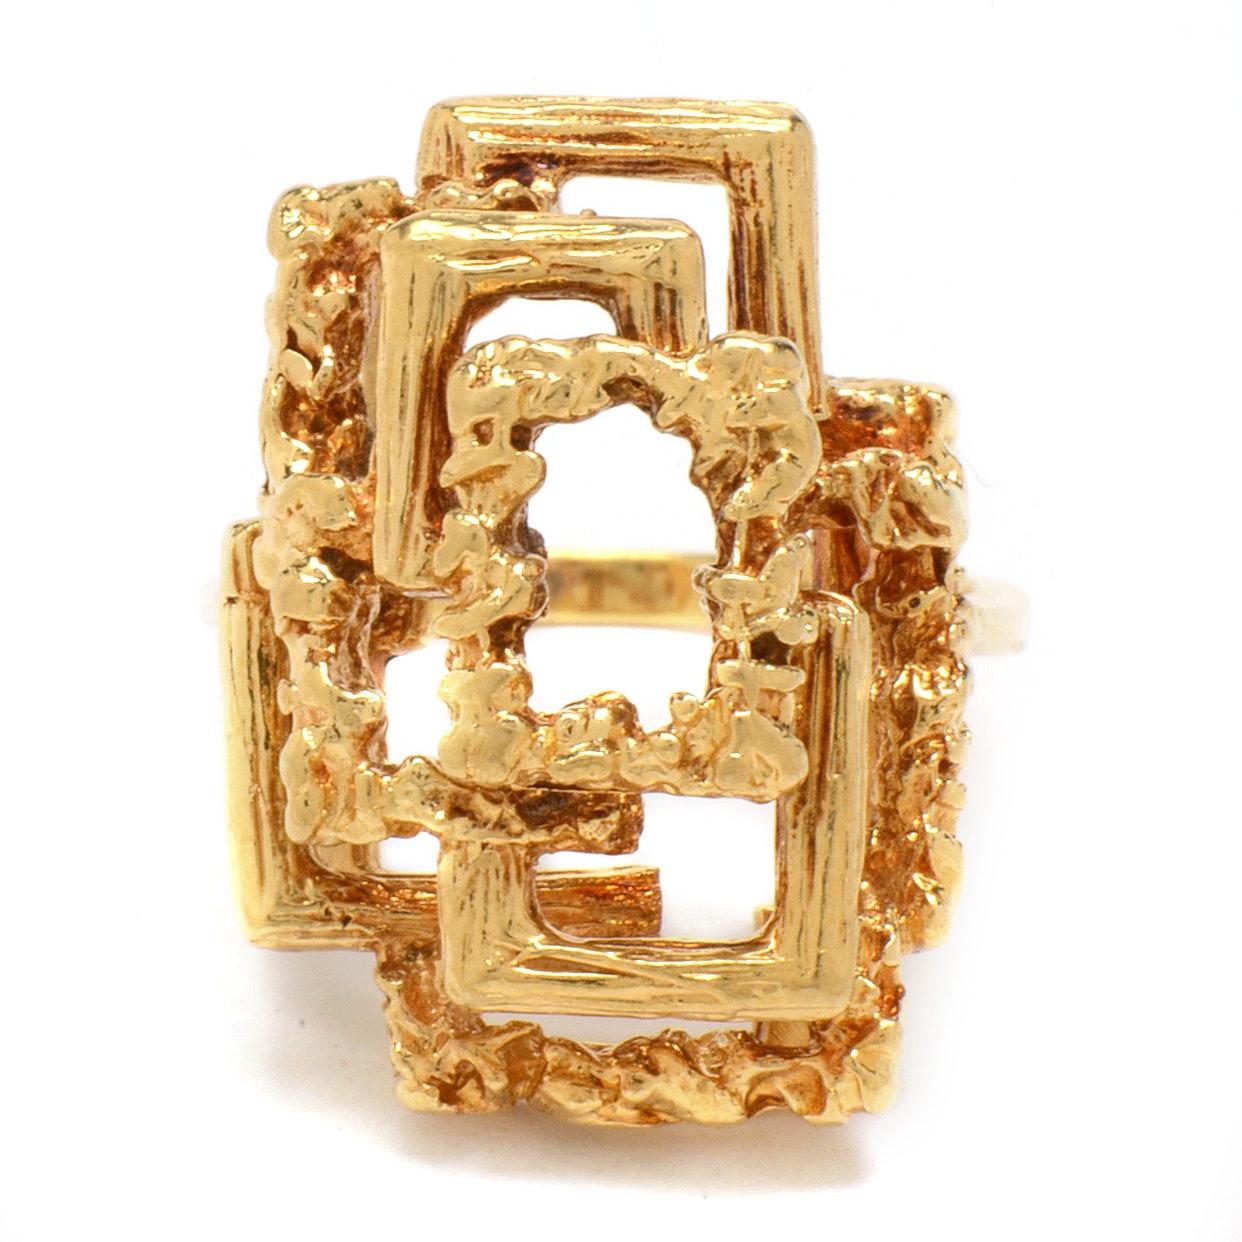 Vintage 18K Yellow Gold Brutalist Openwork Ring